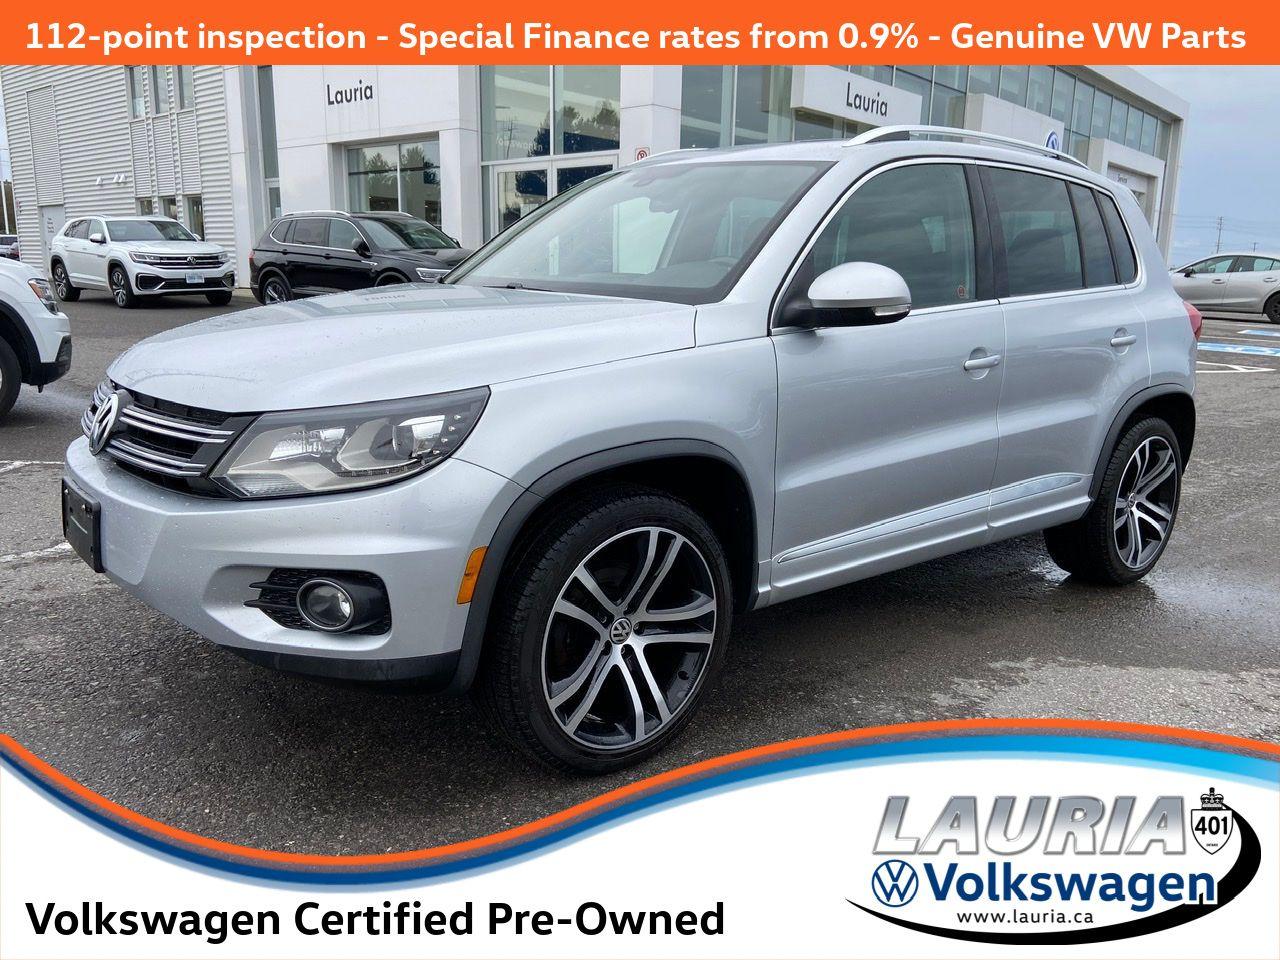 used 2017 Volkswagen Tiguan car, priced at $24,888